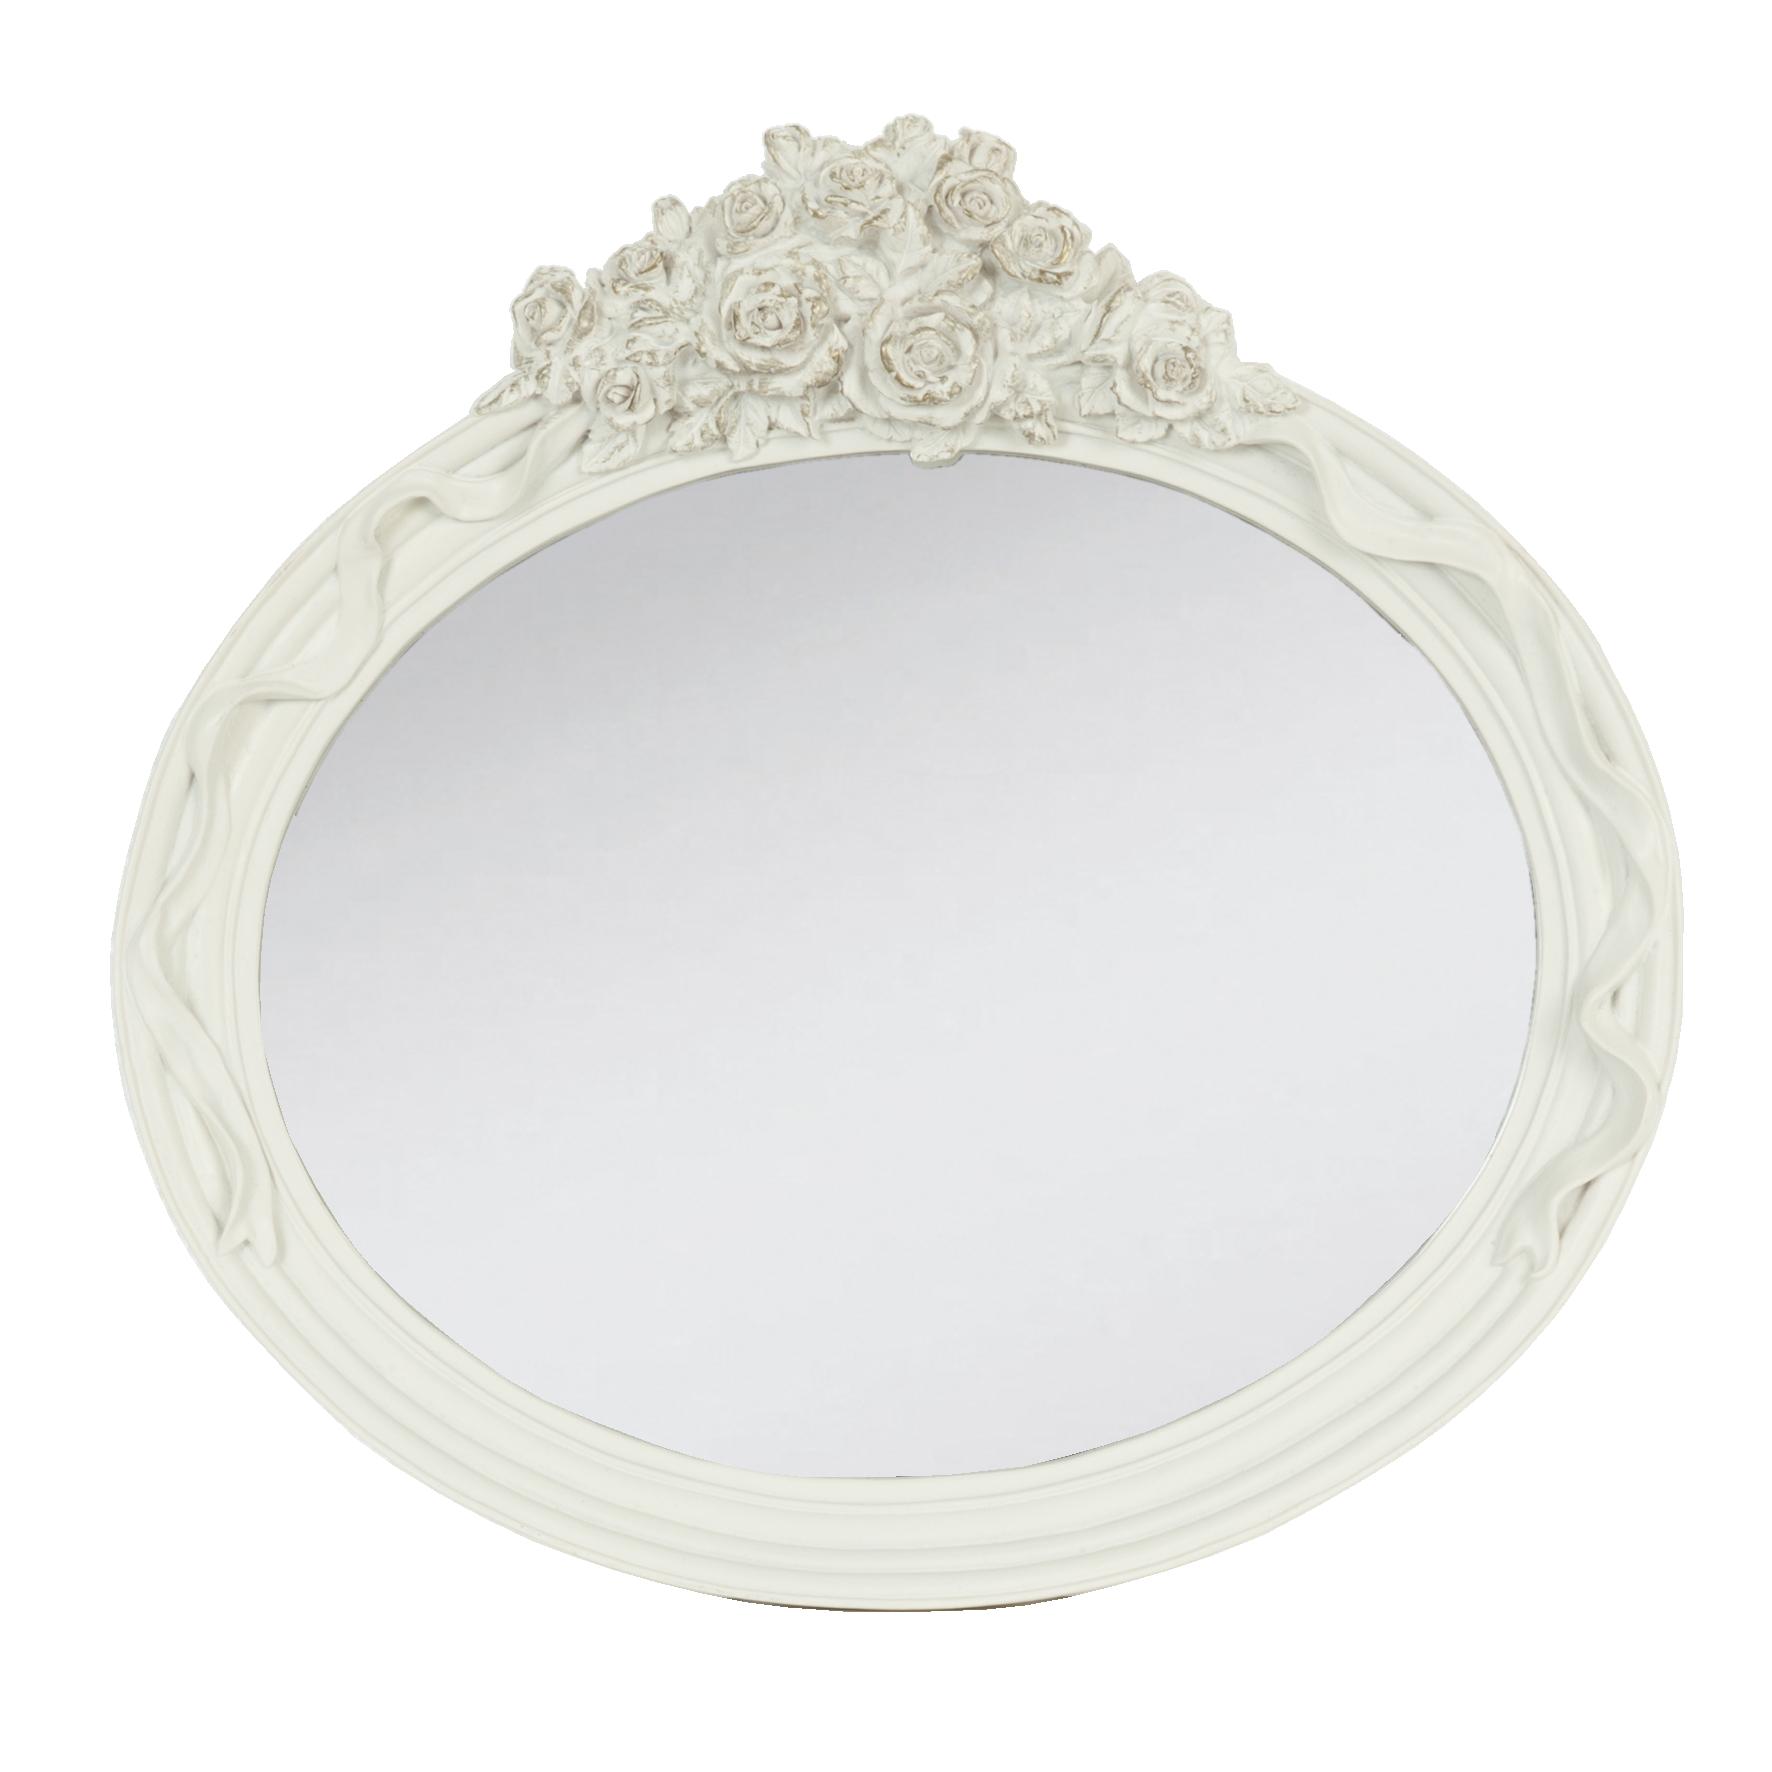 sias decodreams clayre eef spiegel wei oval wandspiegel. Black Bedroom Furniture Sets. Home Design Ideas